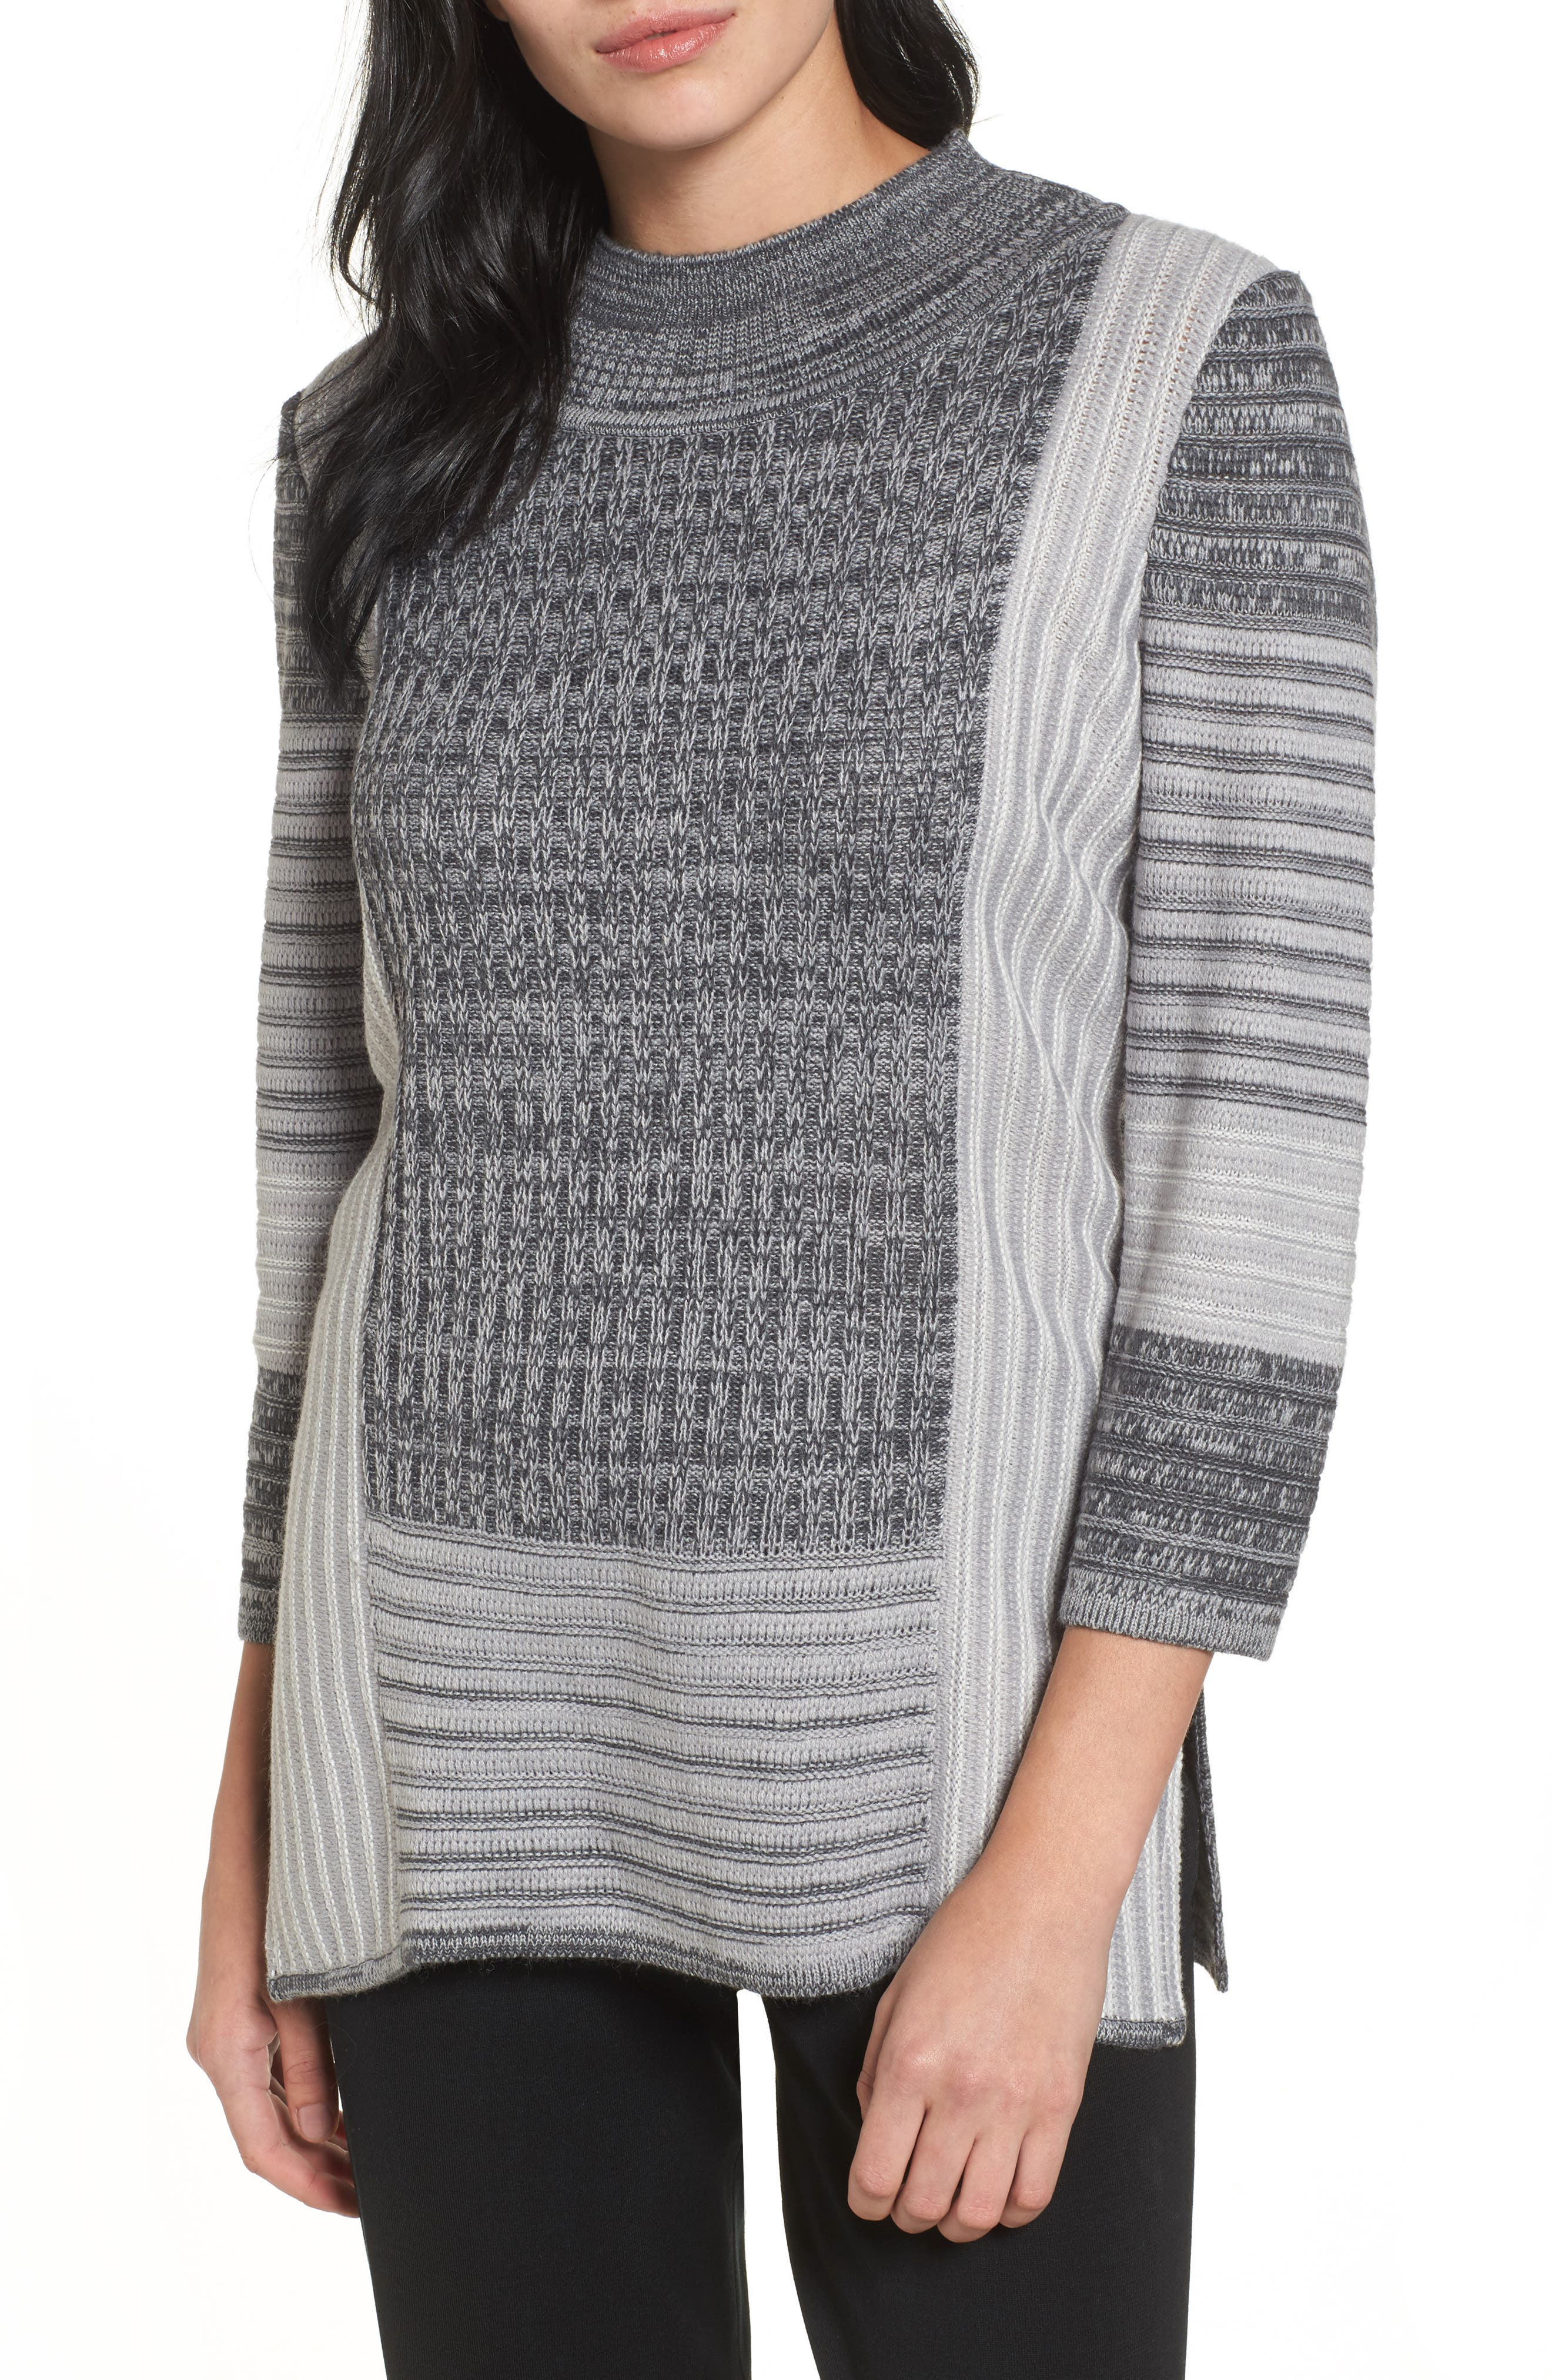 Main Image - Ming Wang Mixed Knit Tunic Sweater